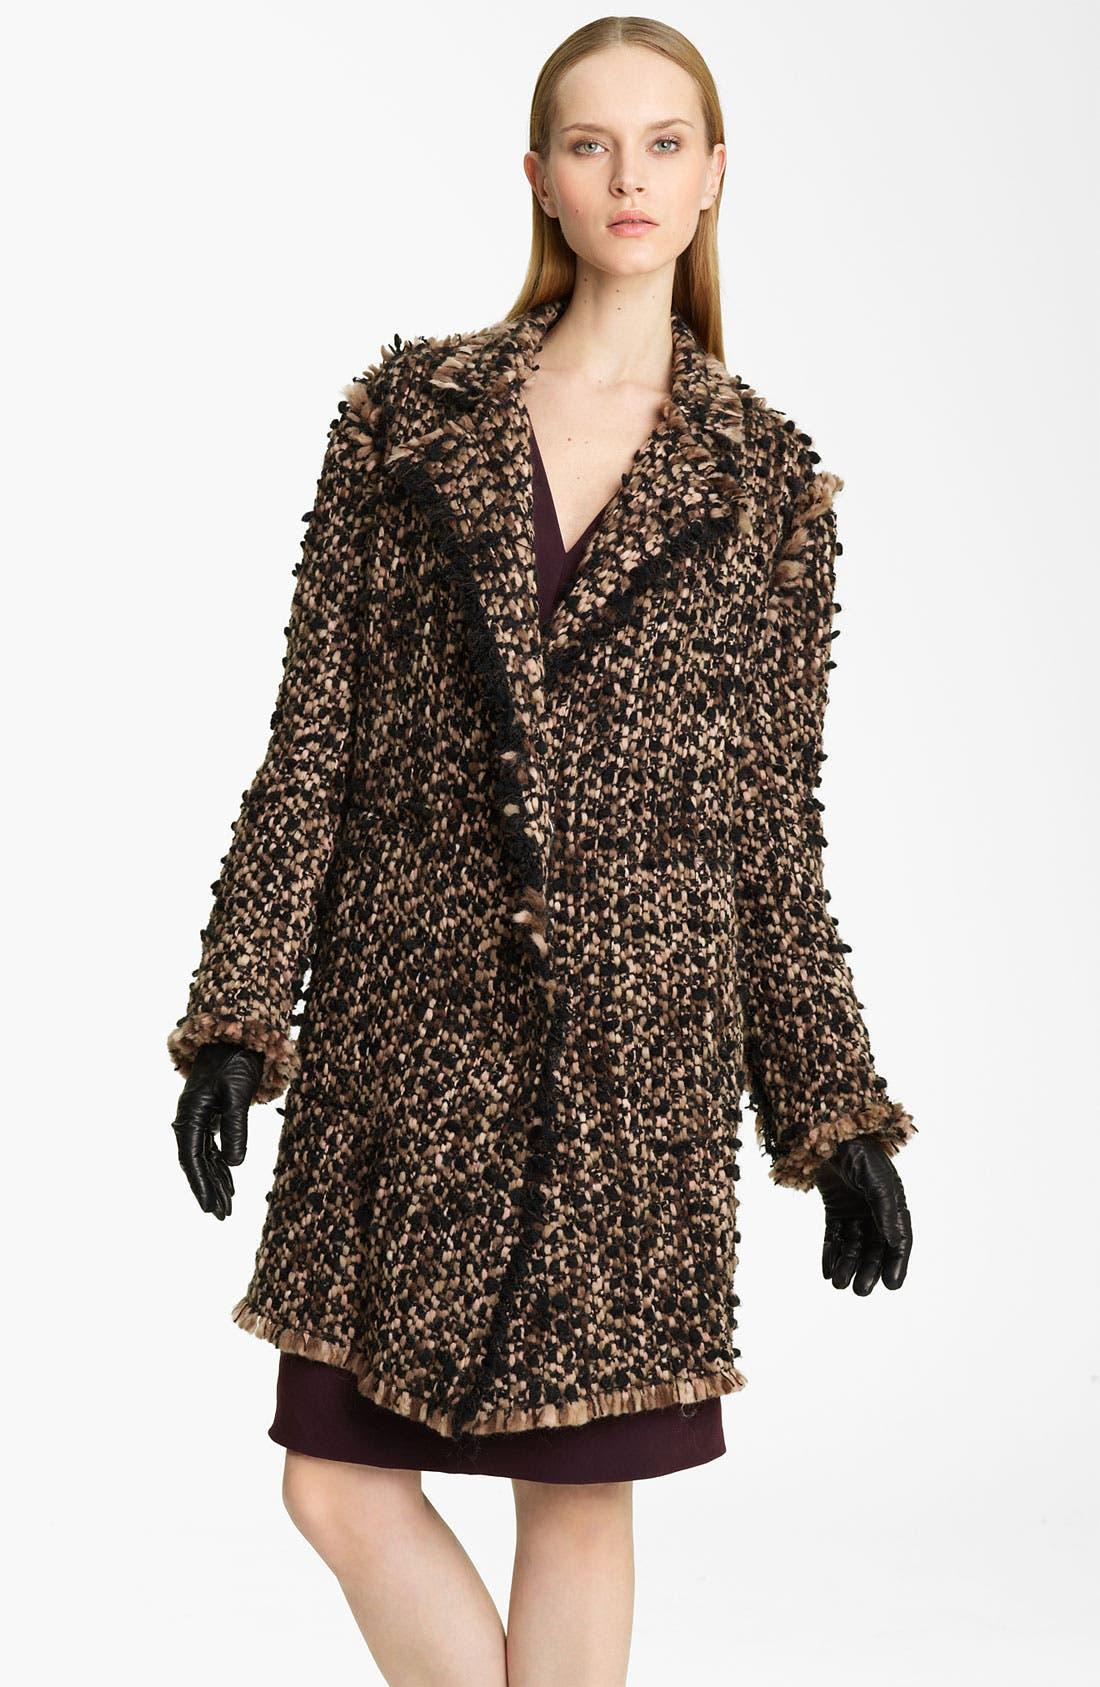 Alternate Image 1 Selected - Lanvin 'Winter' Tweed Coat